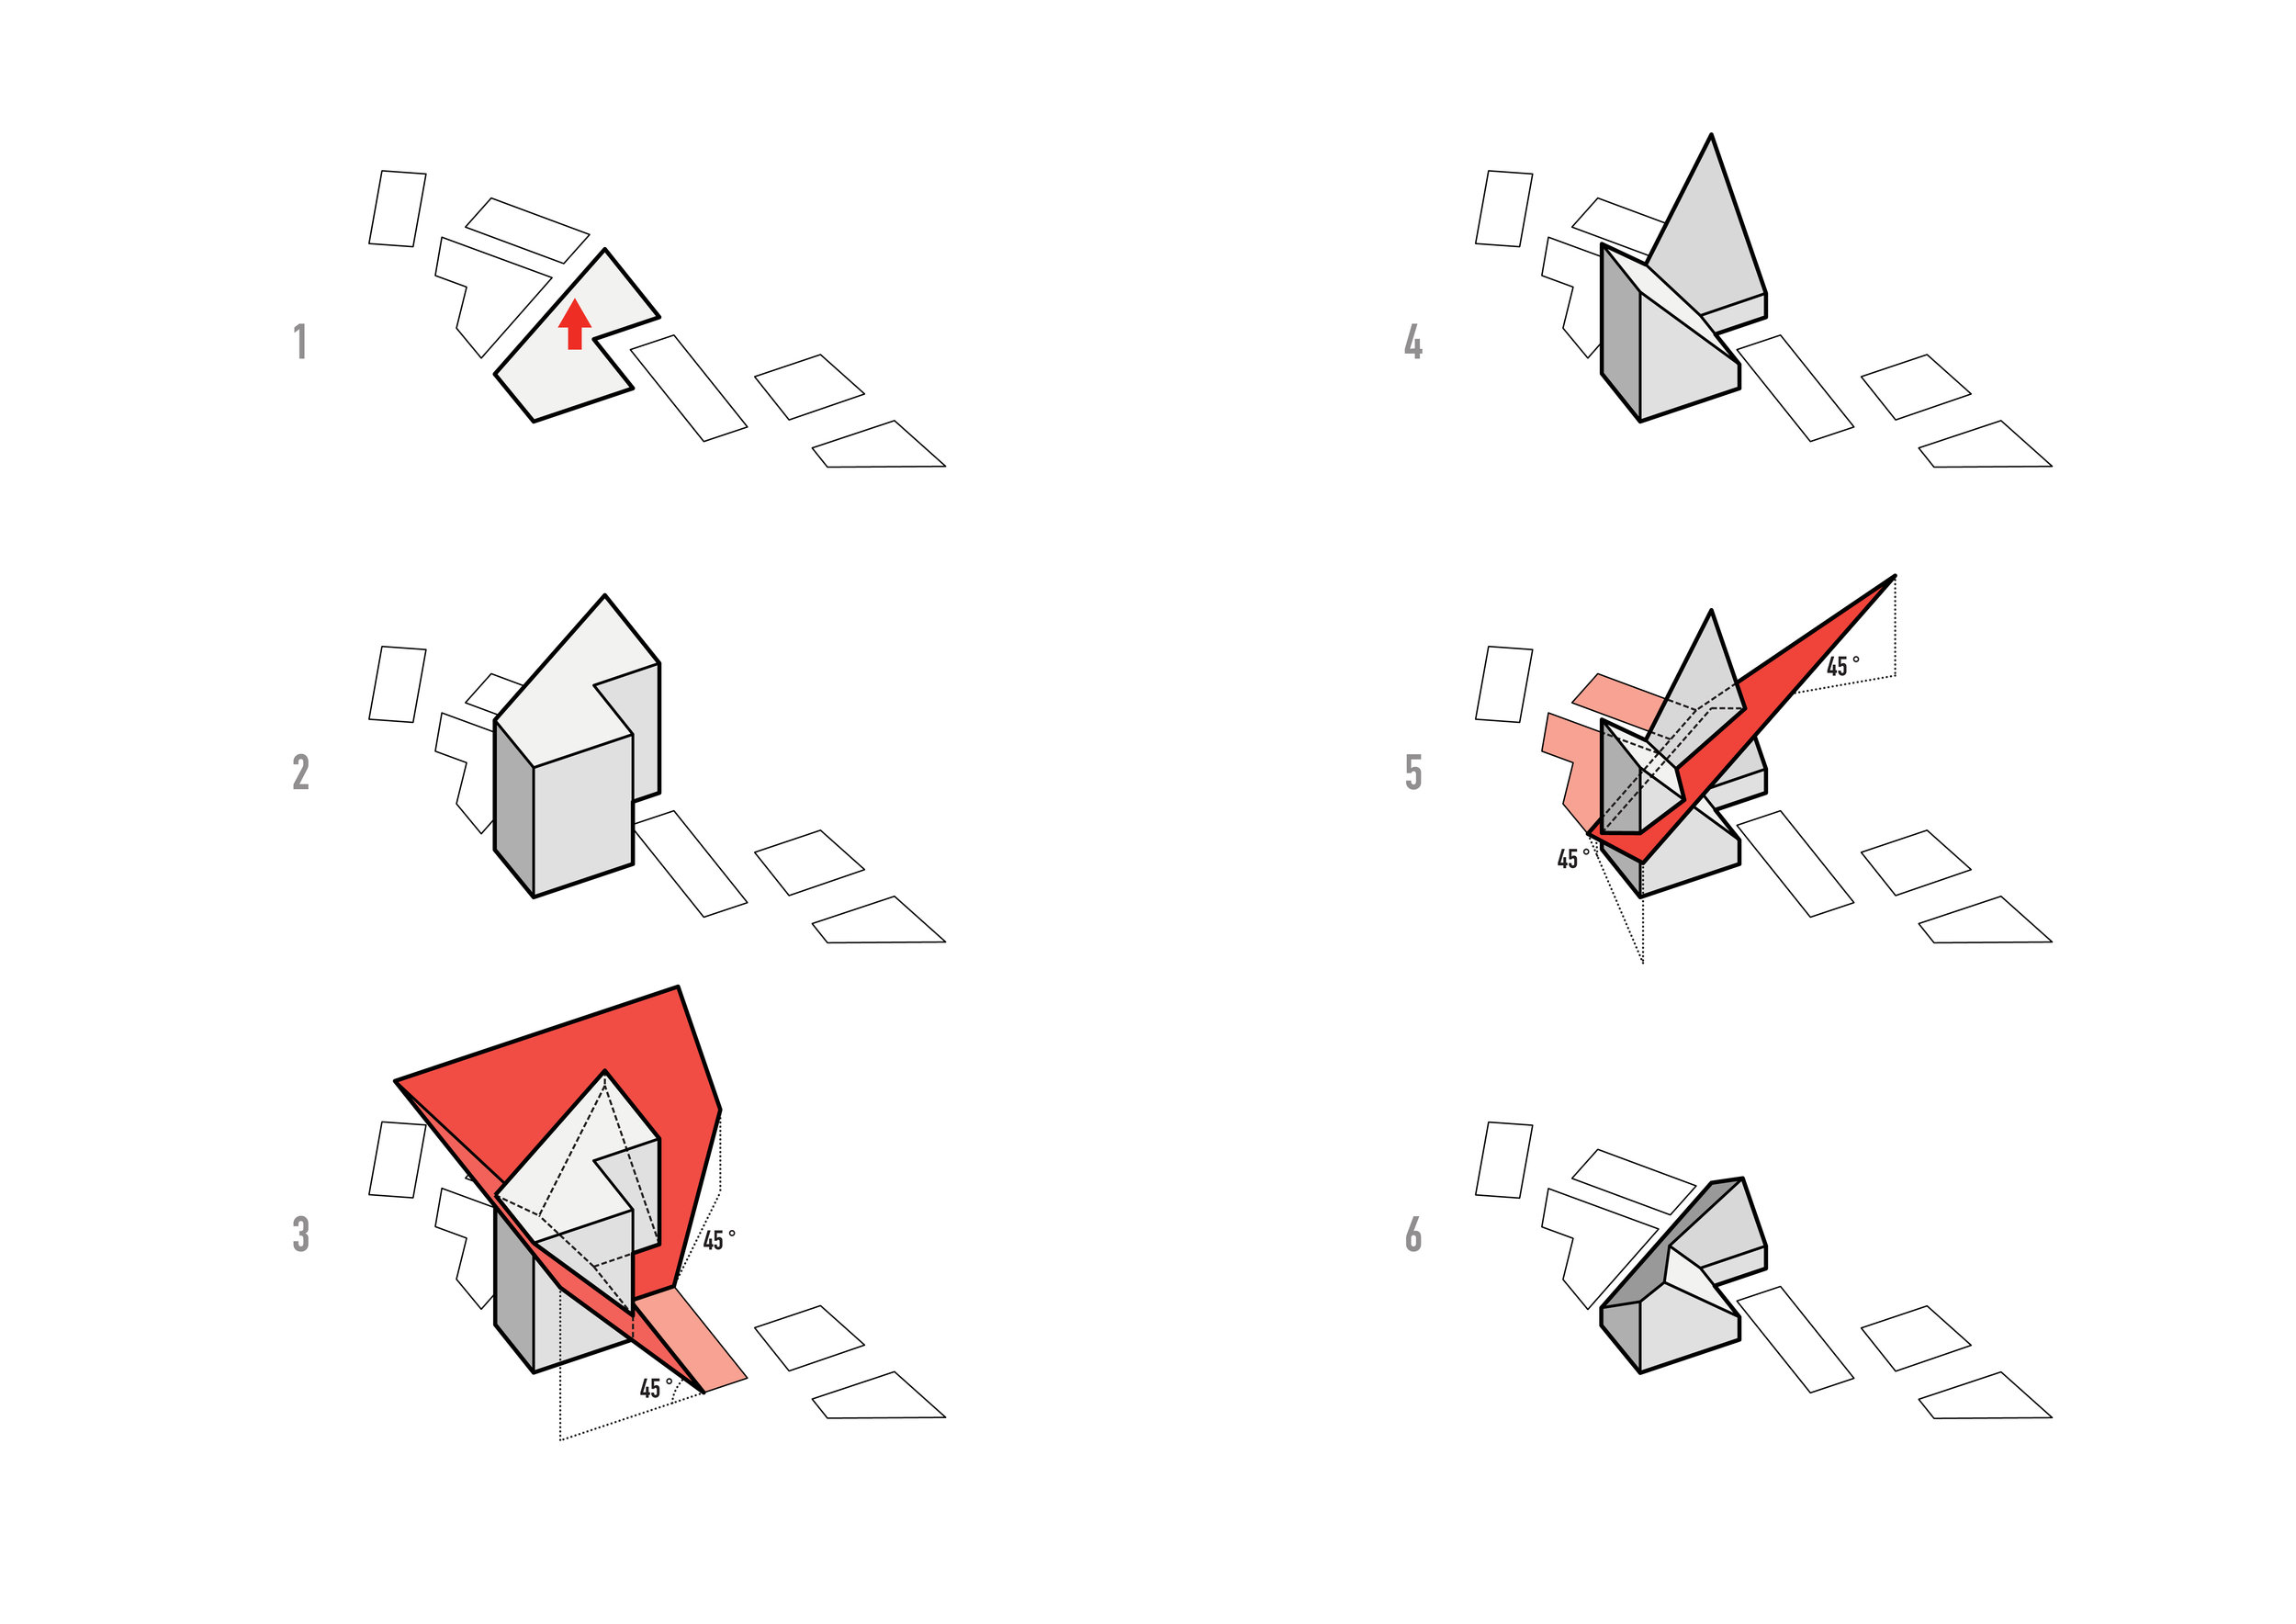 MVRDV_Nieuw Bergen_cuts concept_copywright MVRDV.jpg